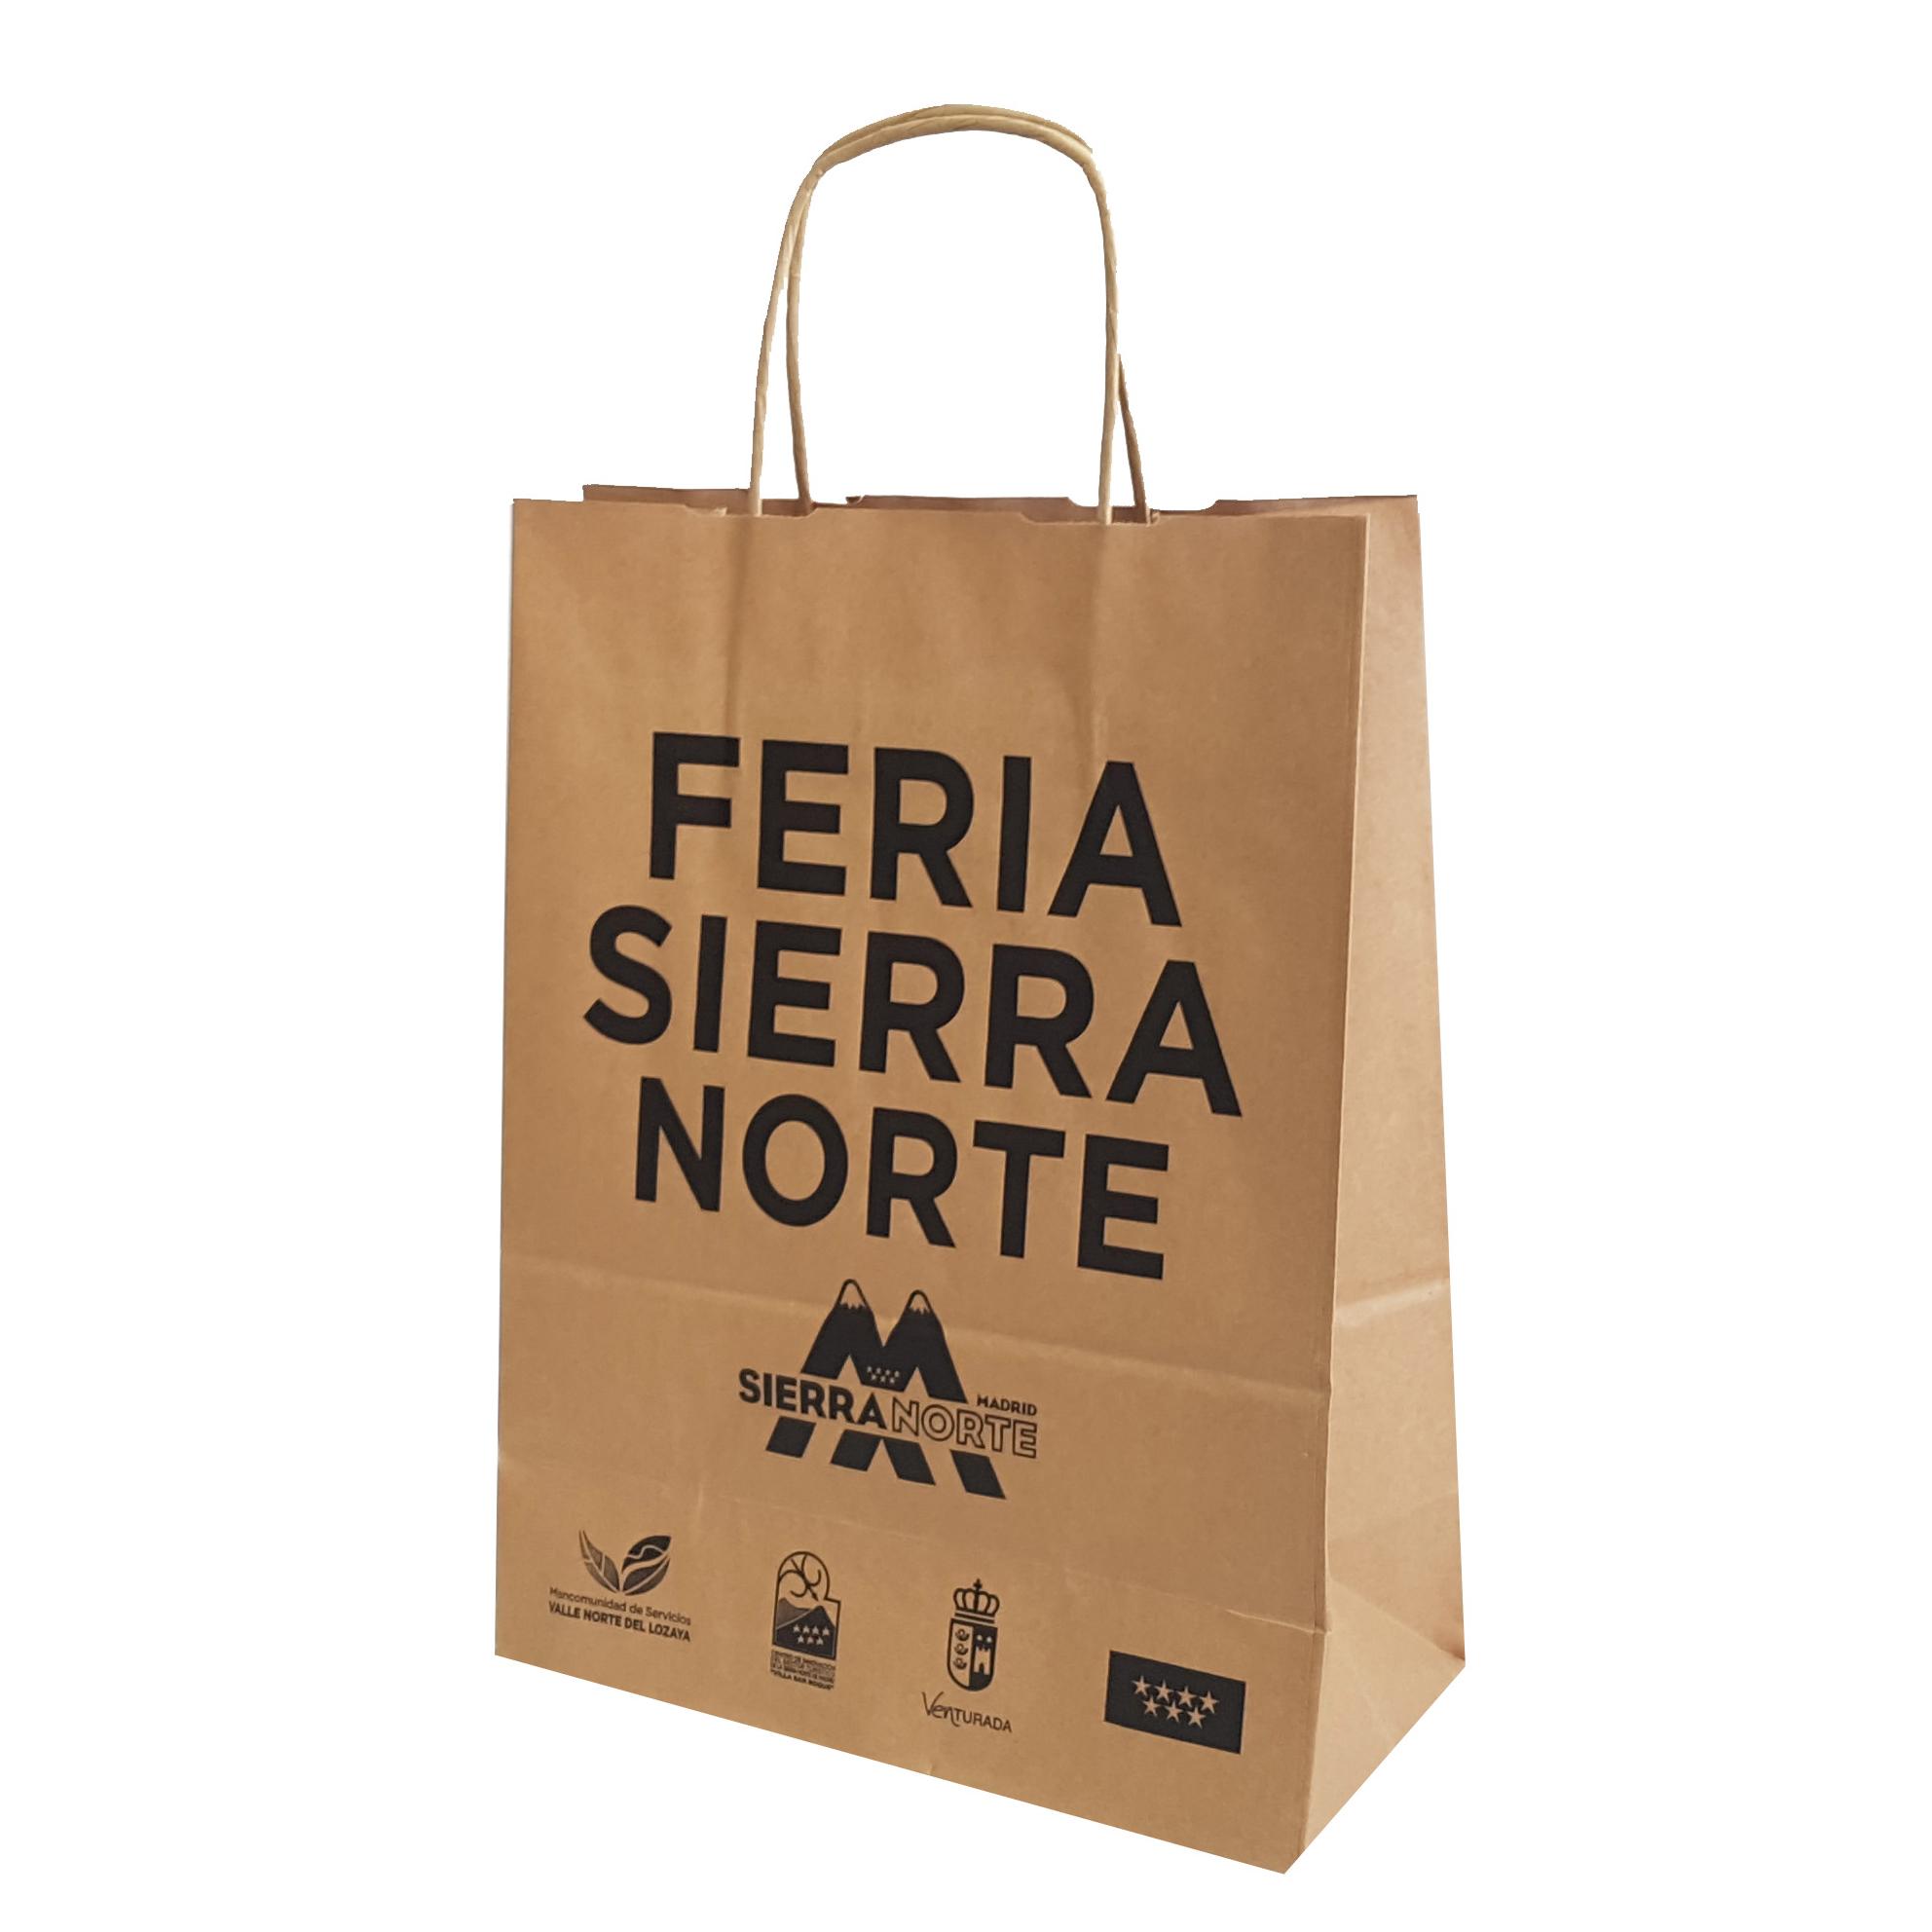 fabricacion-BOLSA-PAPEL-ASA-RIZADA-FERIA-SIERRA-NORTE